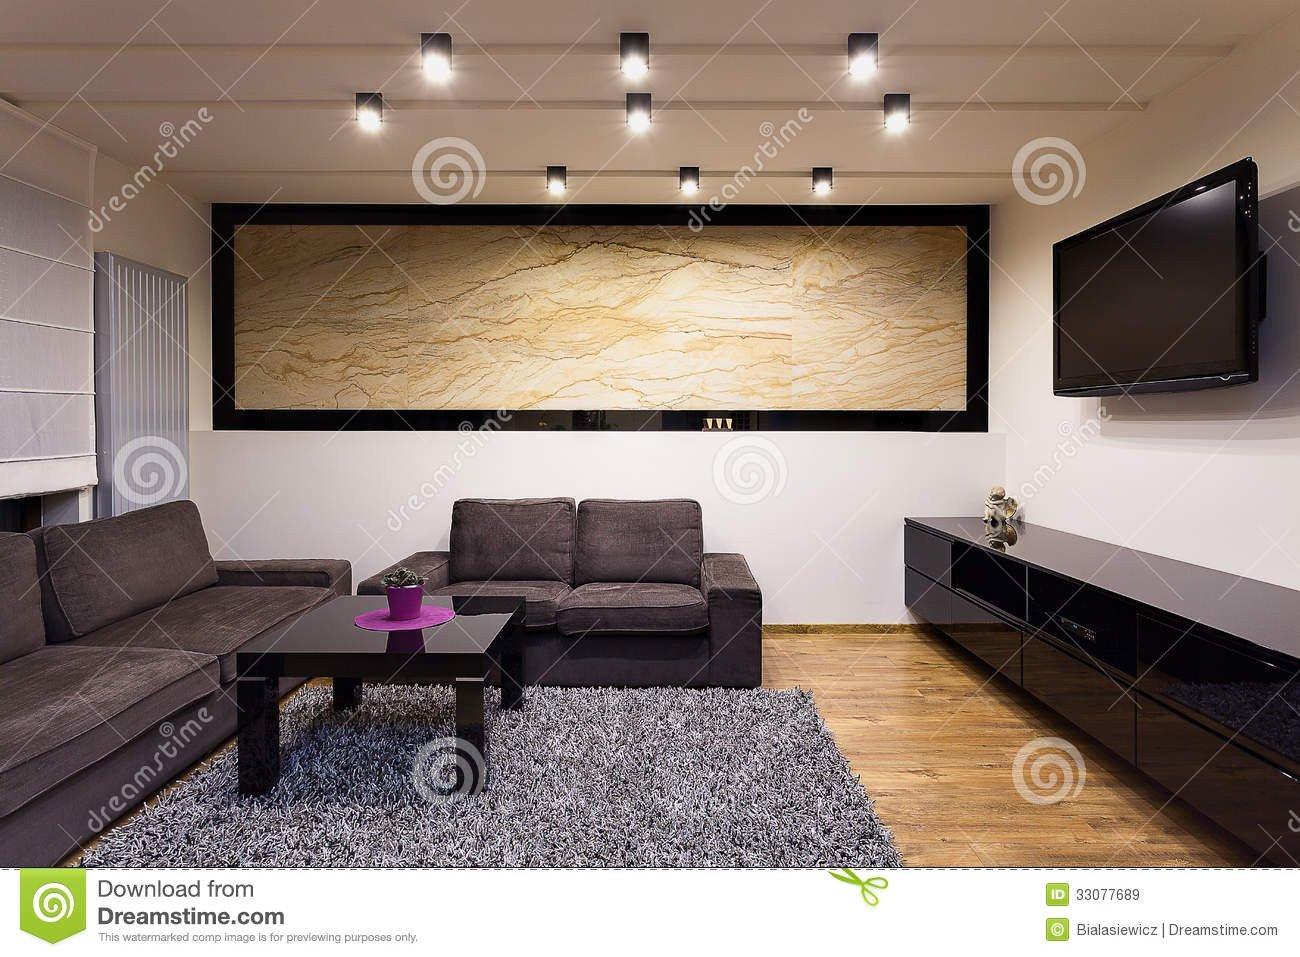 Comfortable Living Room Apartment Urban Apartment fortable Living Room Stock Image